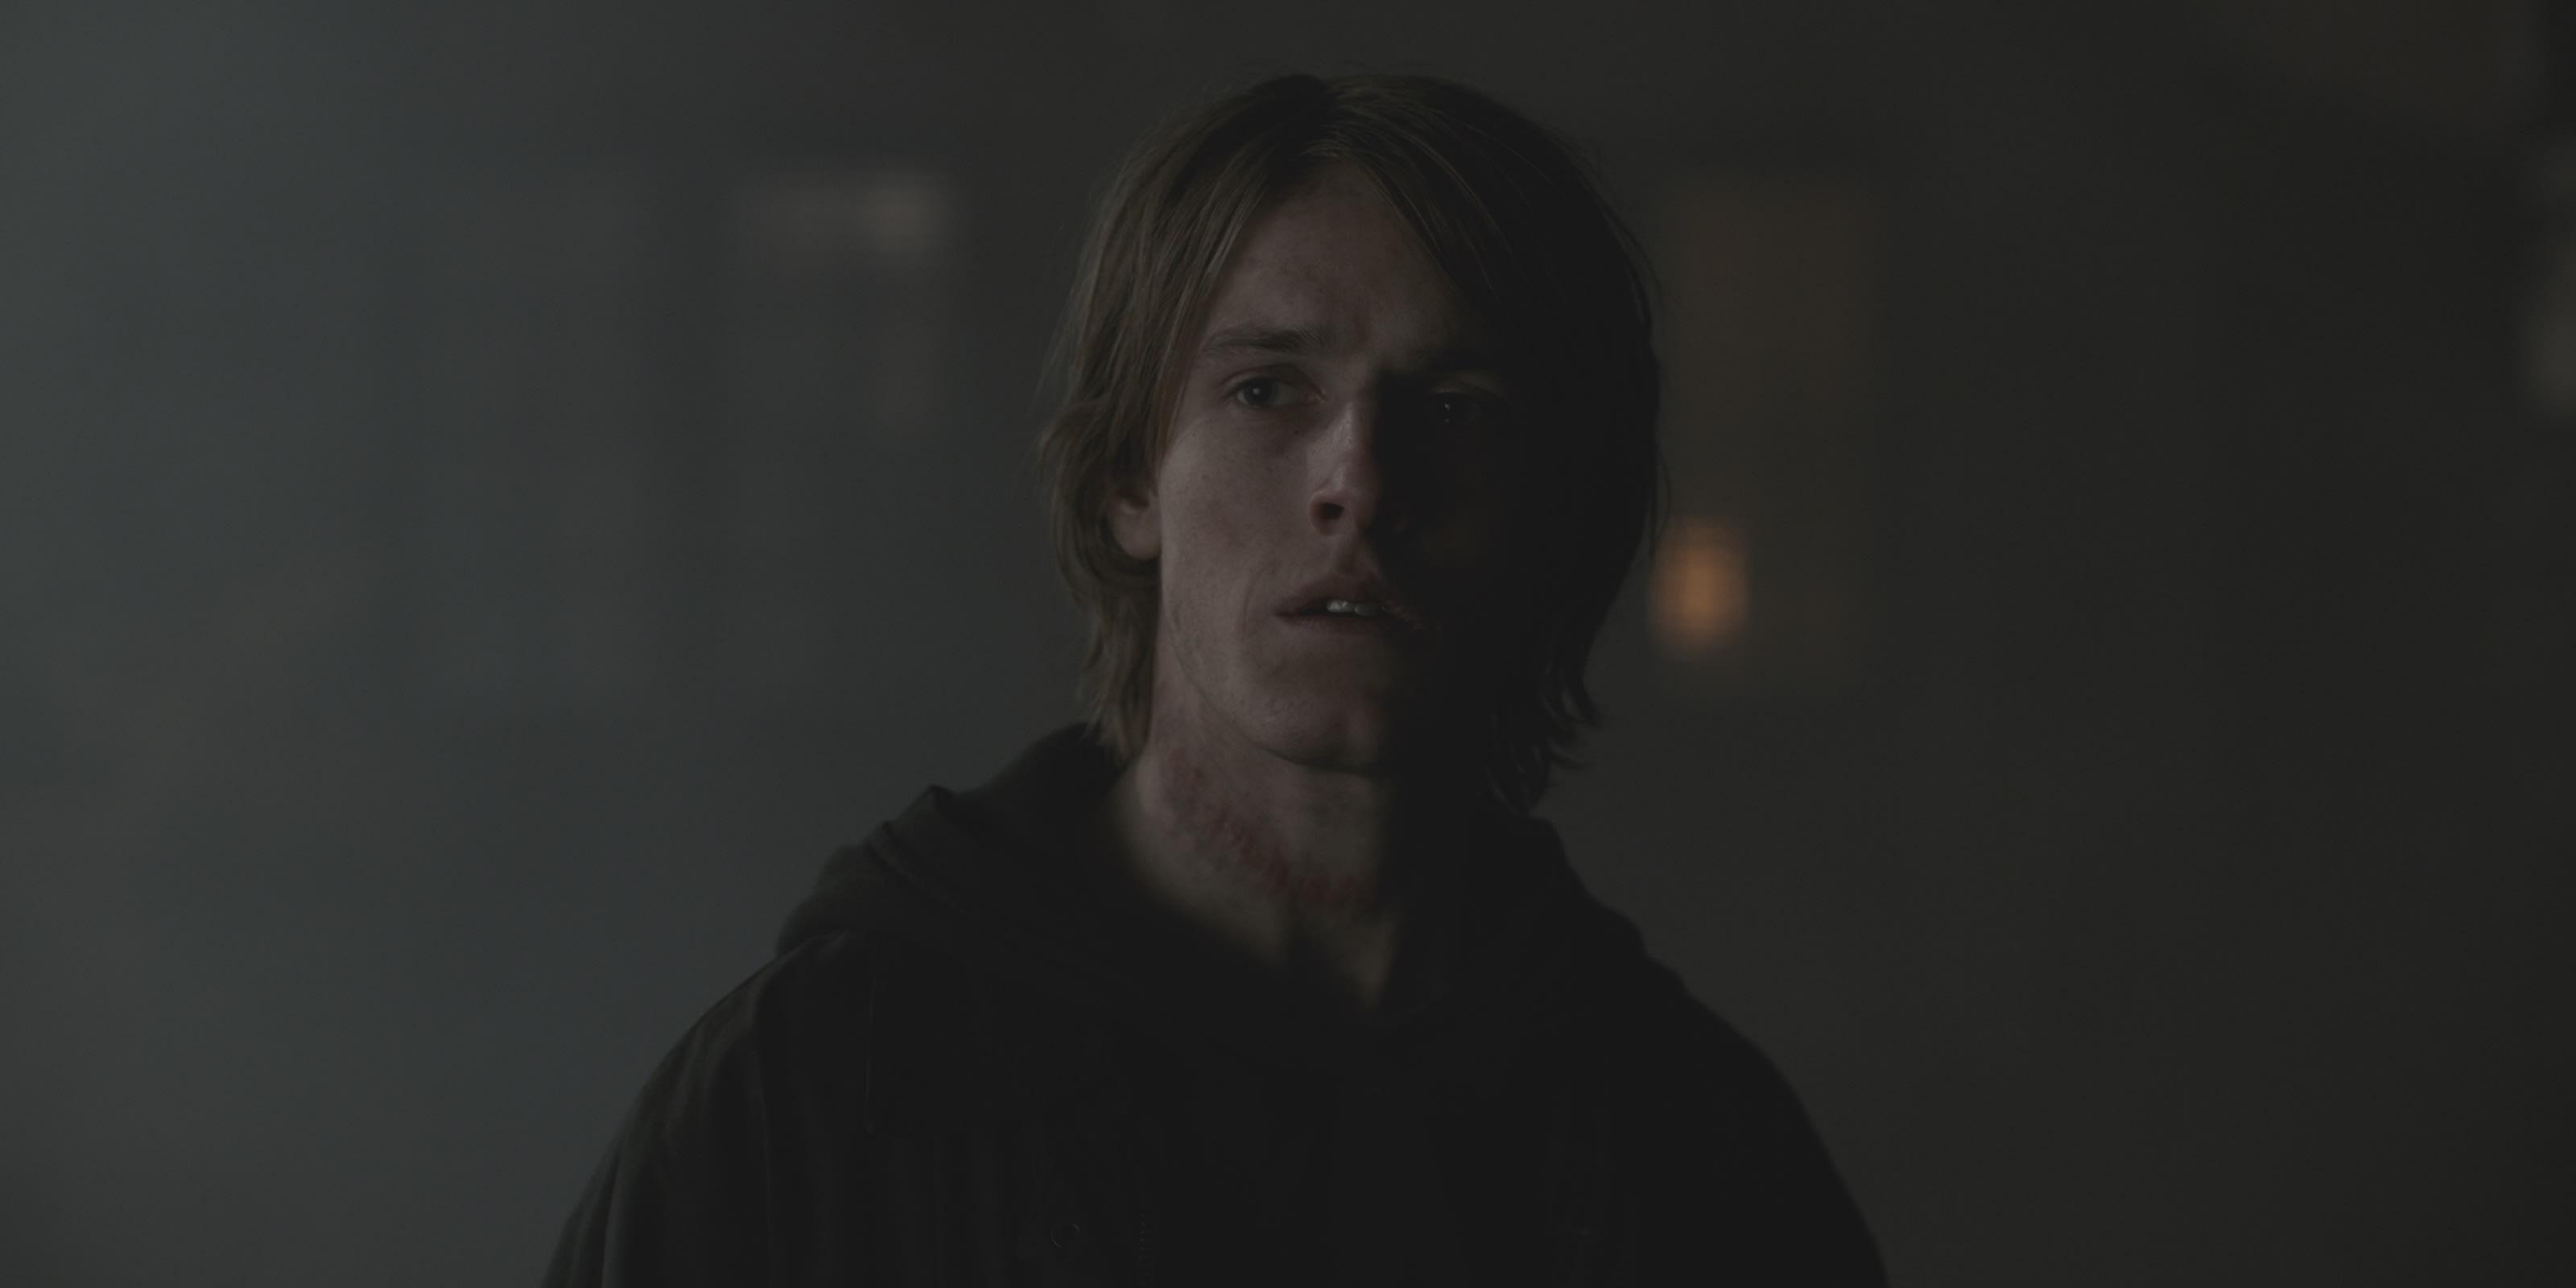 Dark Season 3, Episode 6 recap: It's a Fight between Light and Shadow